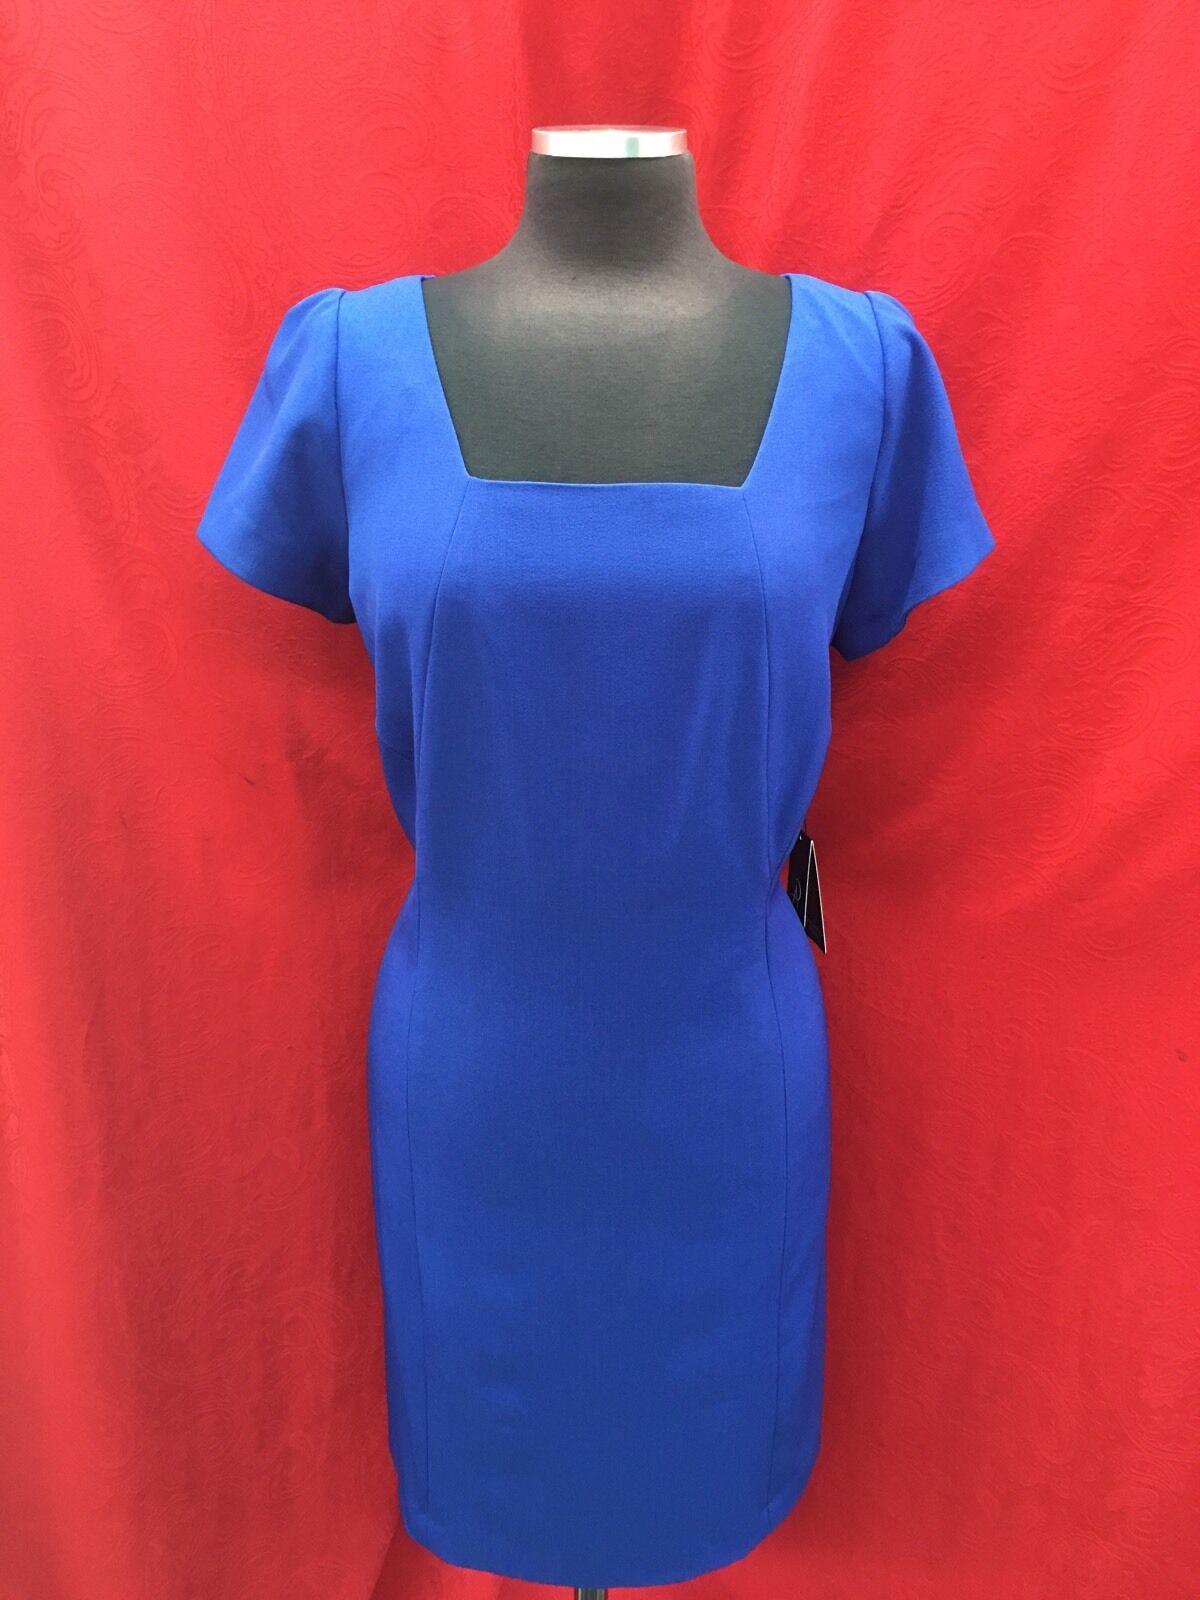 bb2339c2f51 ADRAINNA PAPELL DRESS DRESS DRESS NEW WITH TAG SIZE 18W RETAIL 160 LENGTH  39  ROYAL ...